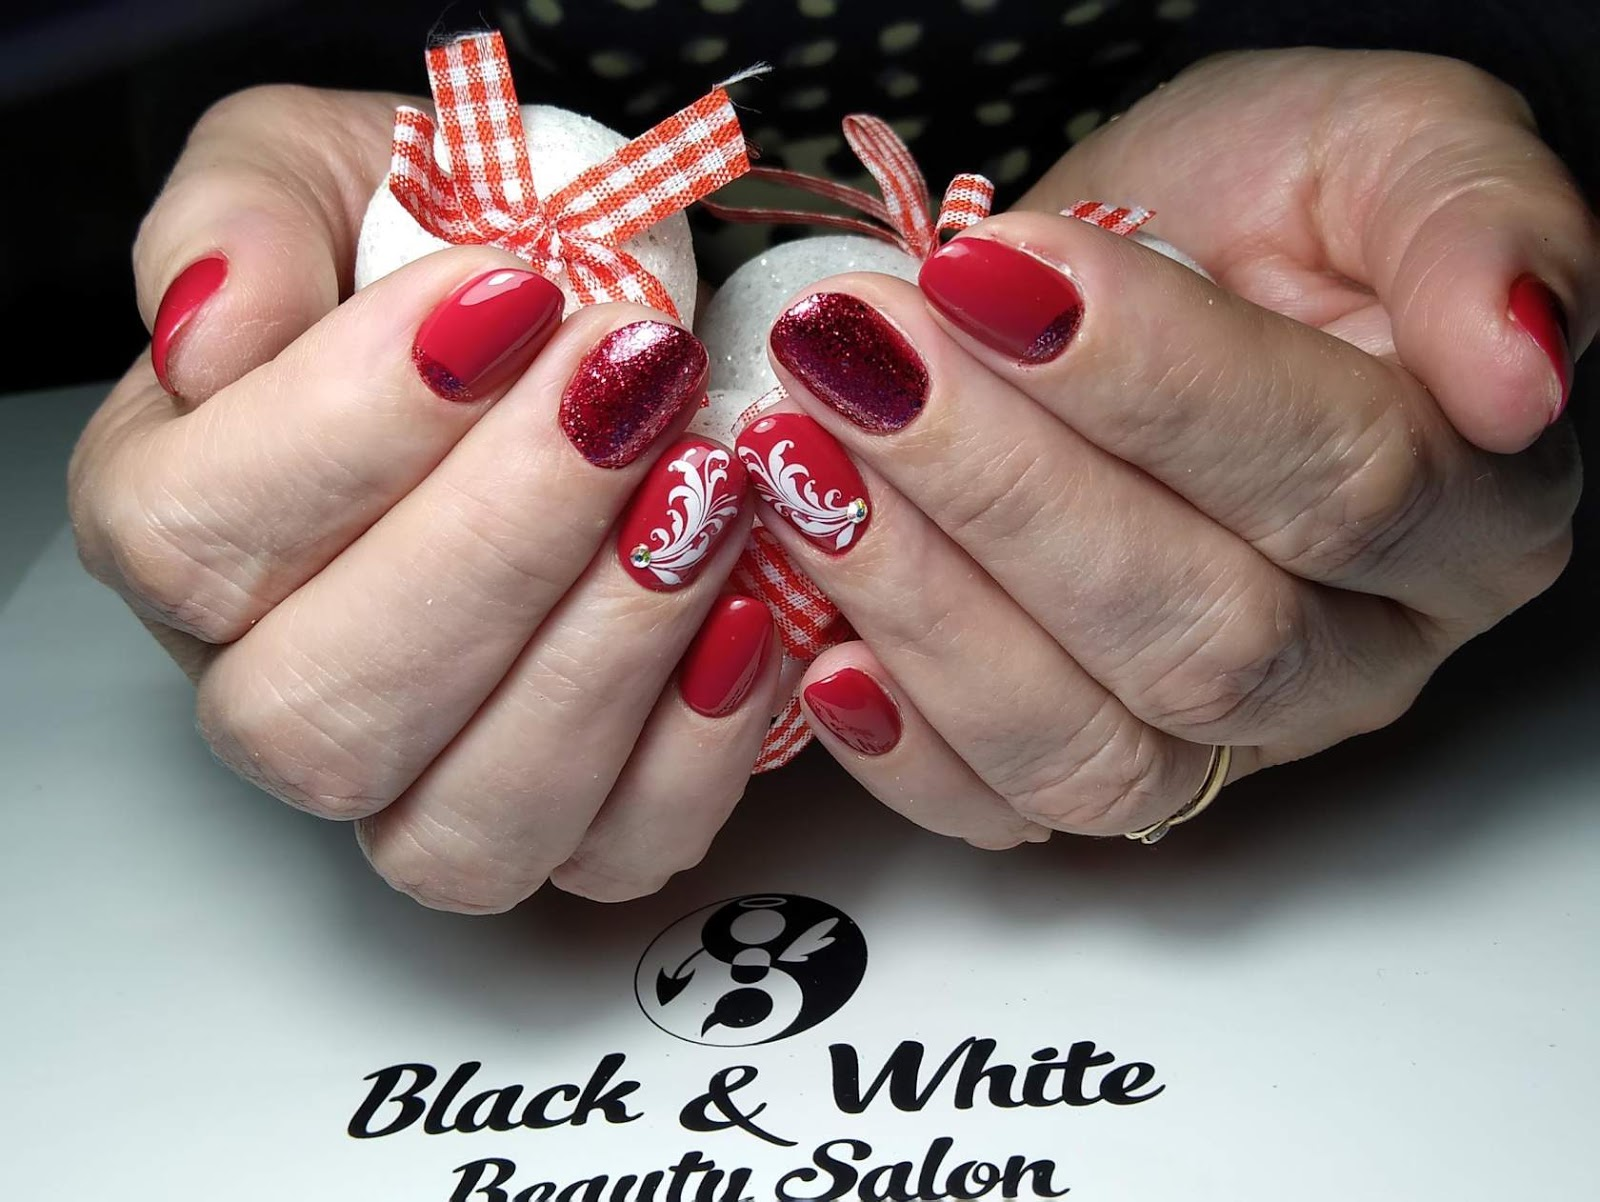 Black & White Nails Art Disign: Nail Salon Totowa Nj